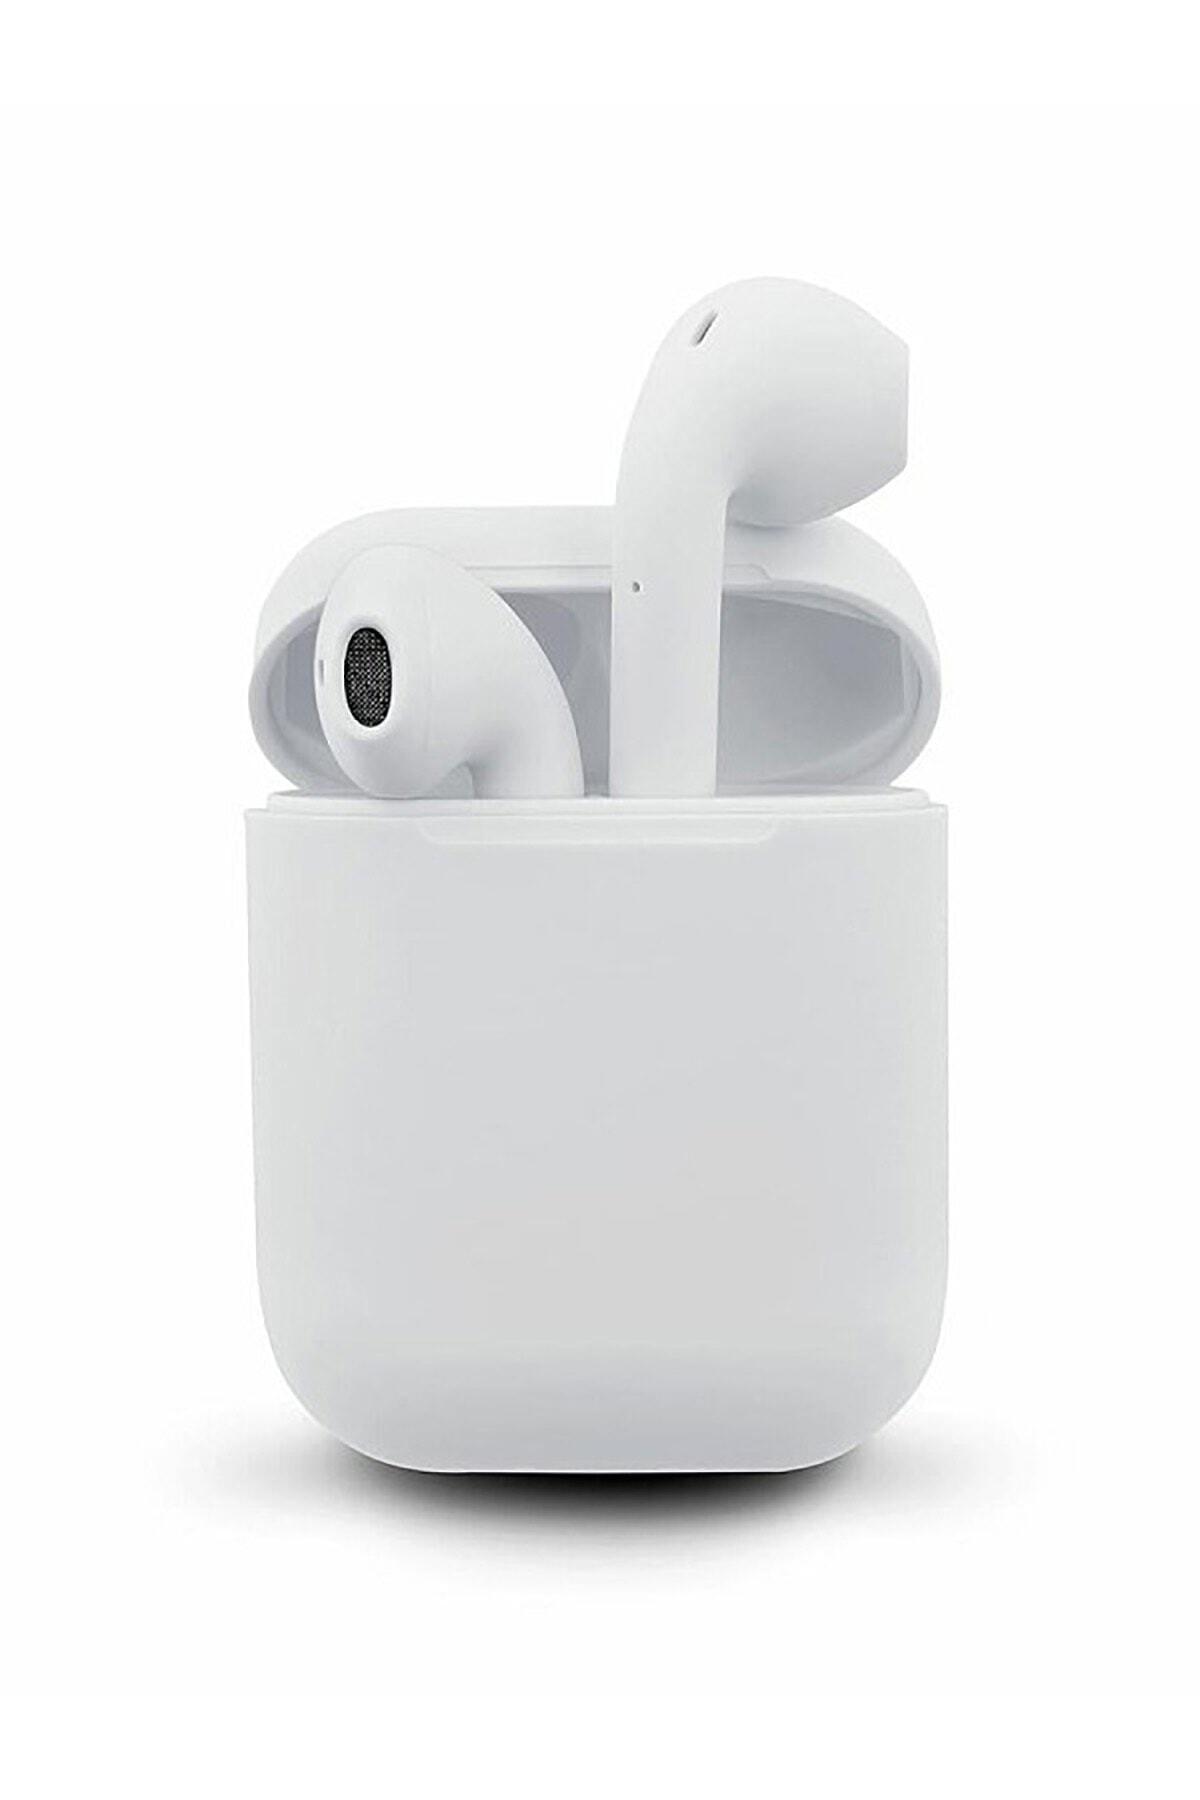 Airpods i12 Beyaz Bluetooth Kulaklık Muhteşem Ses Performansı